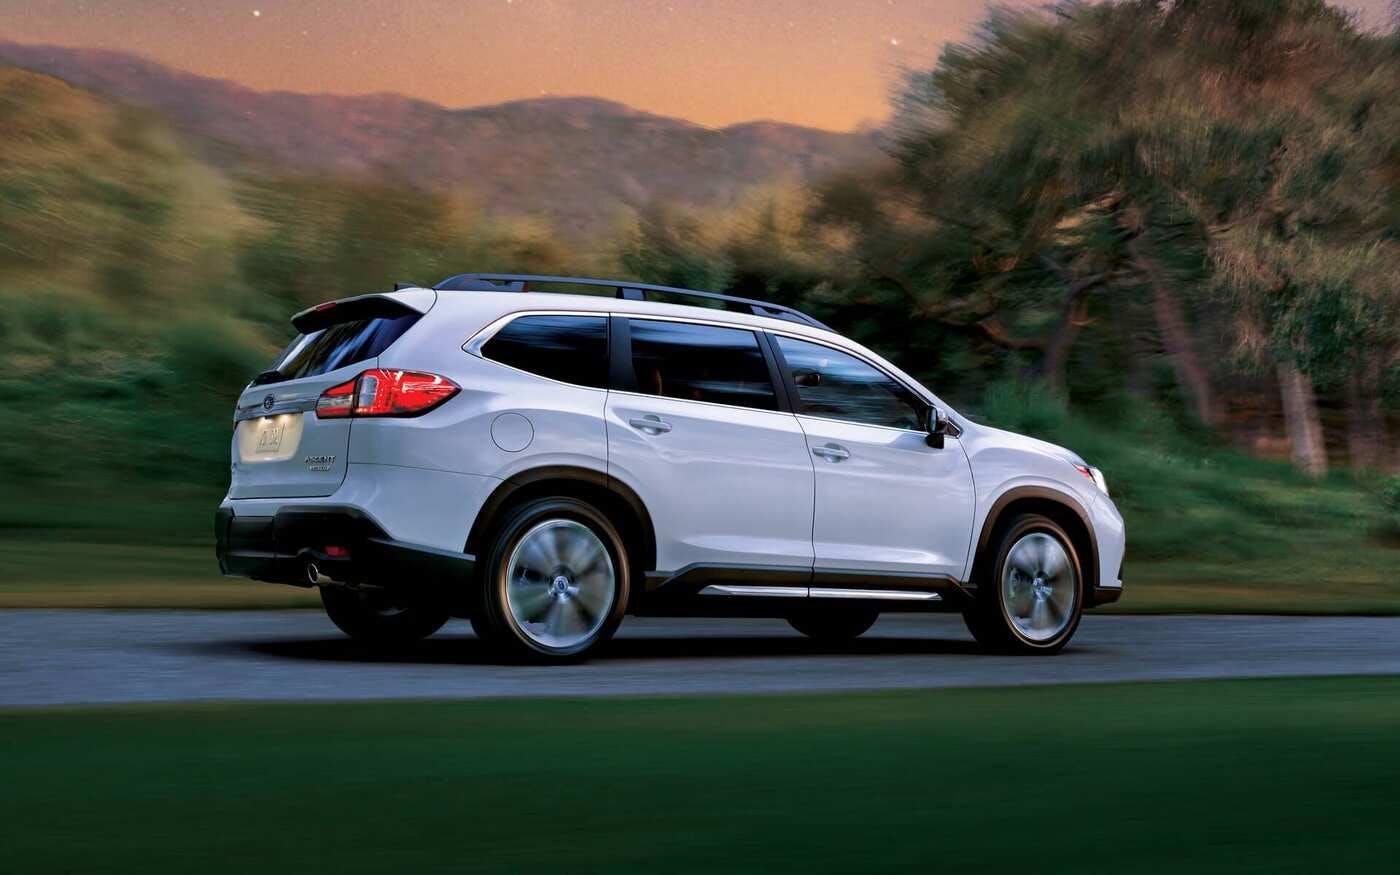 2020 Subaru Ascent Comparisons Reviews Pictures Truecar